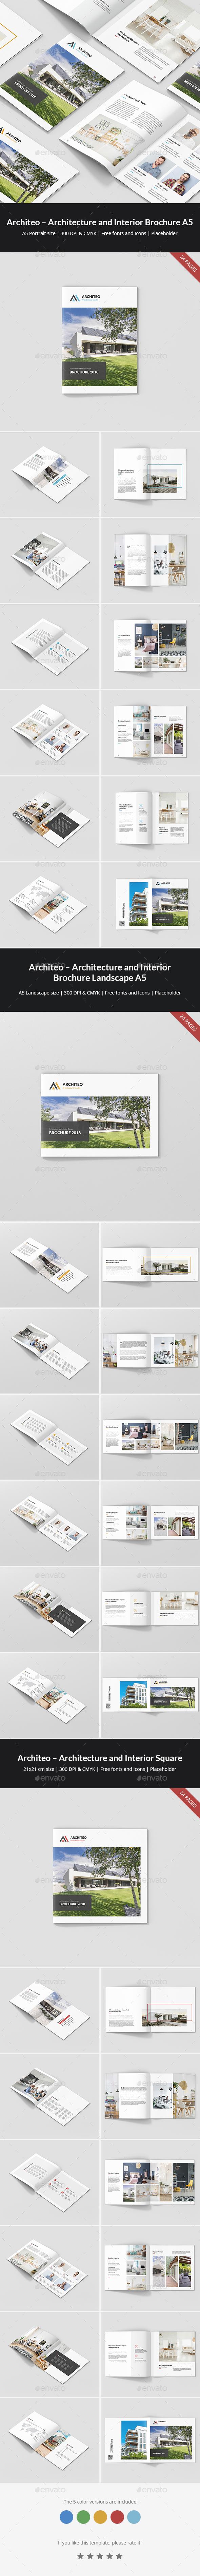 Architeo – Architecture and Interior Brochures Bundle Print Templates 3 in 1 - Portfolio Brochures